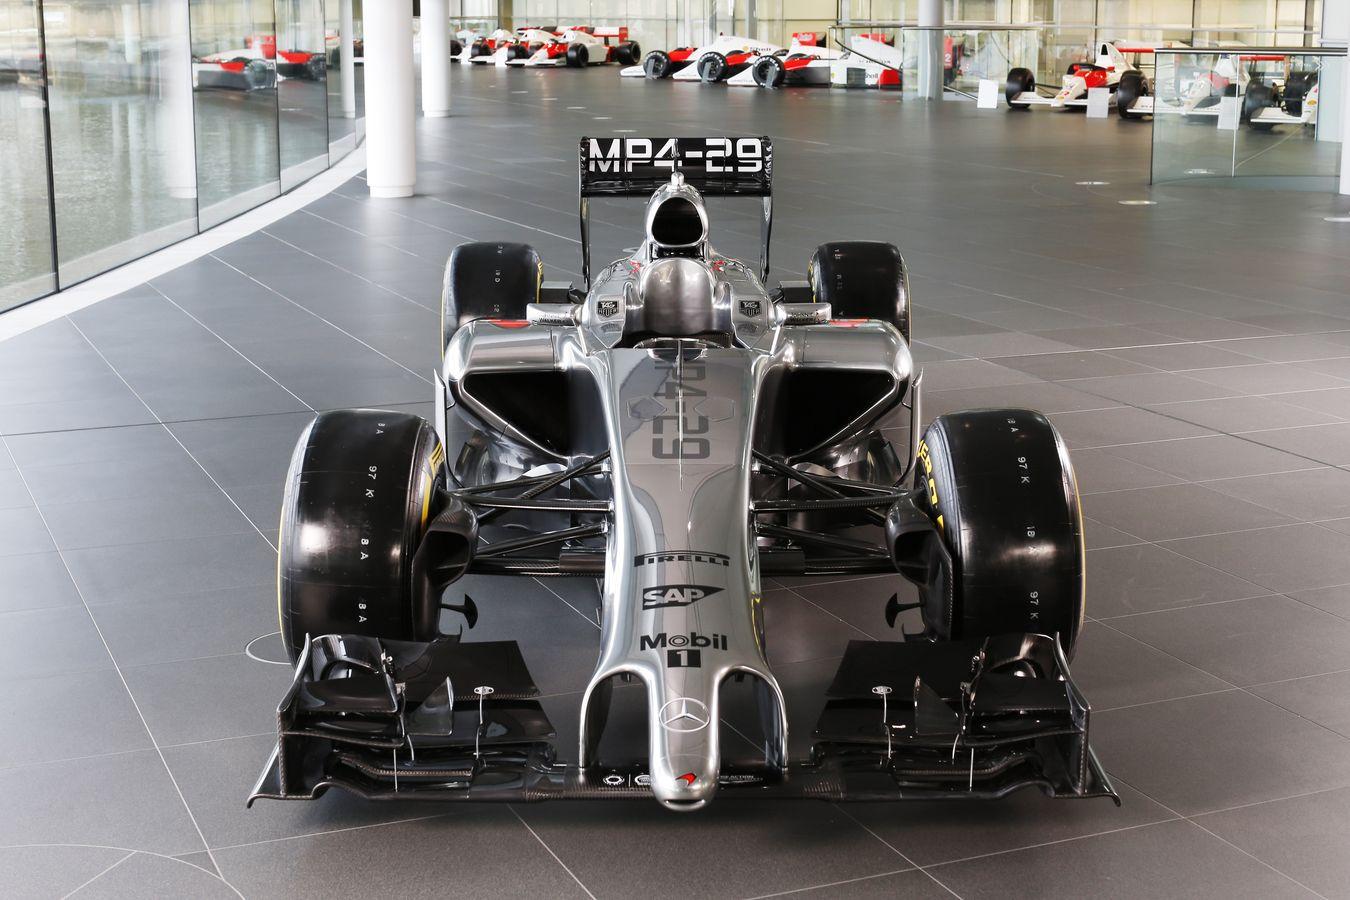 equipos-formula-1-mclaren-mp4-29